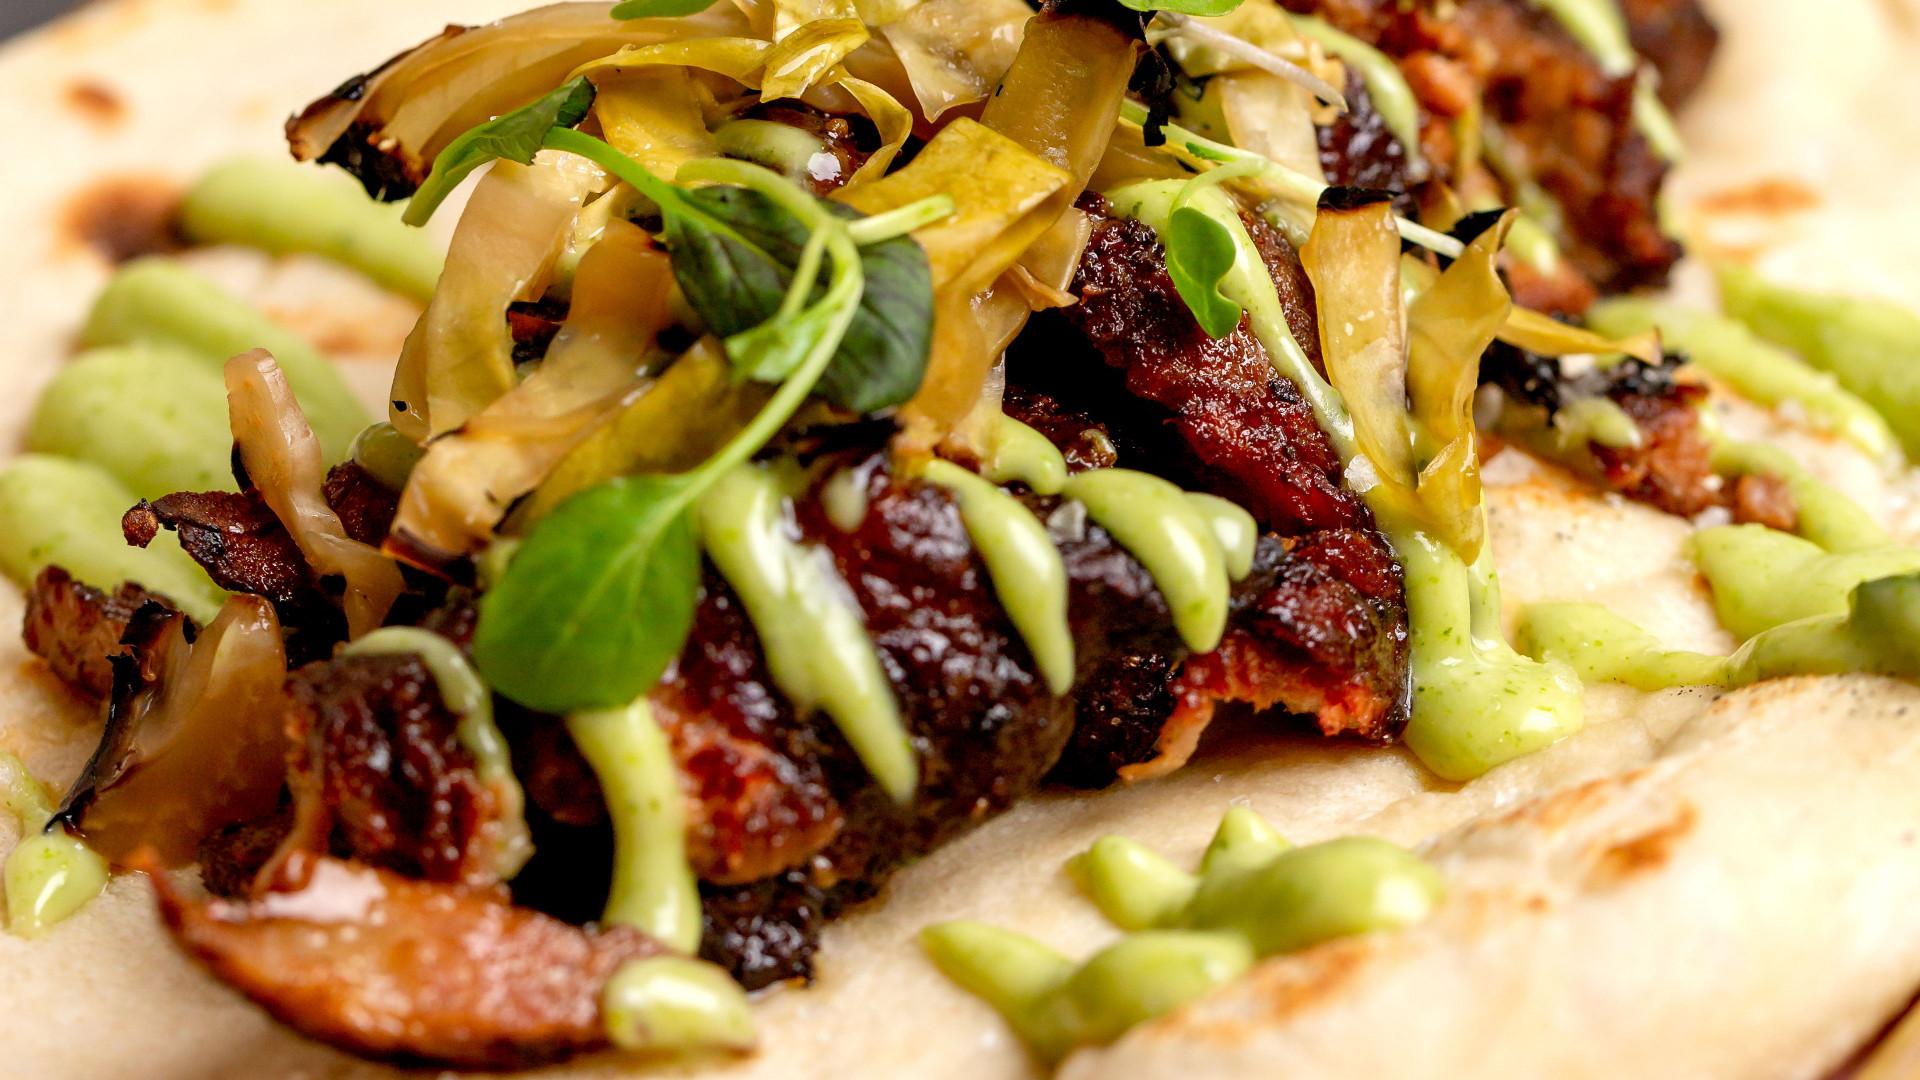 The 15-hour pork Shawarma